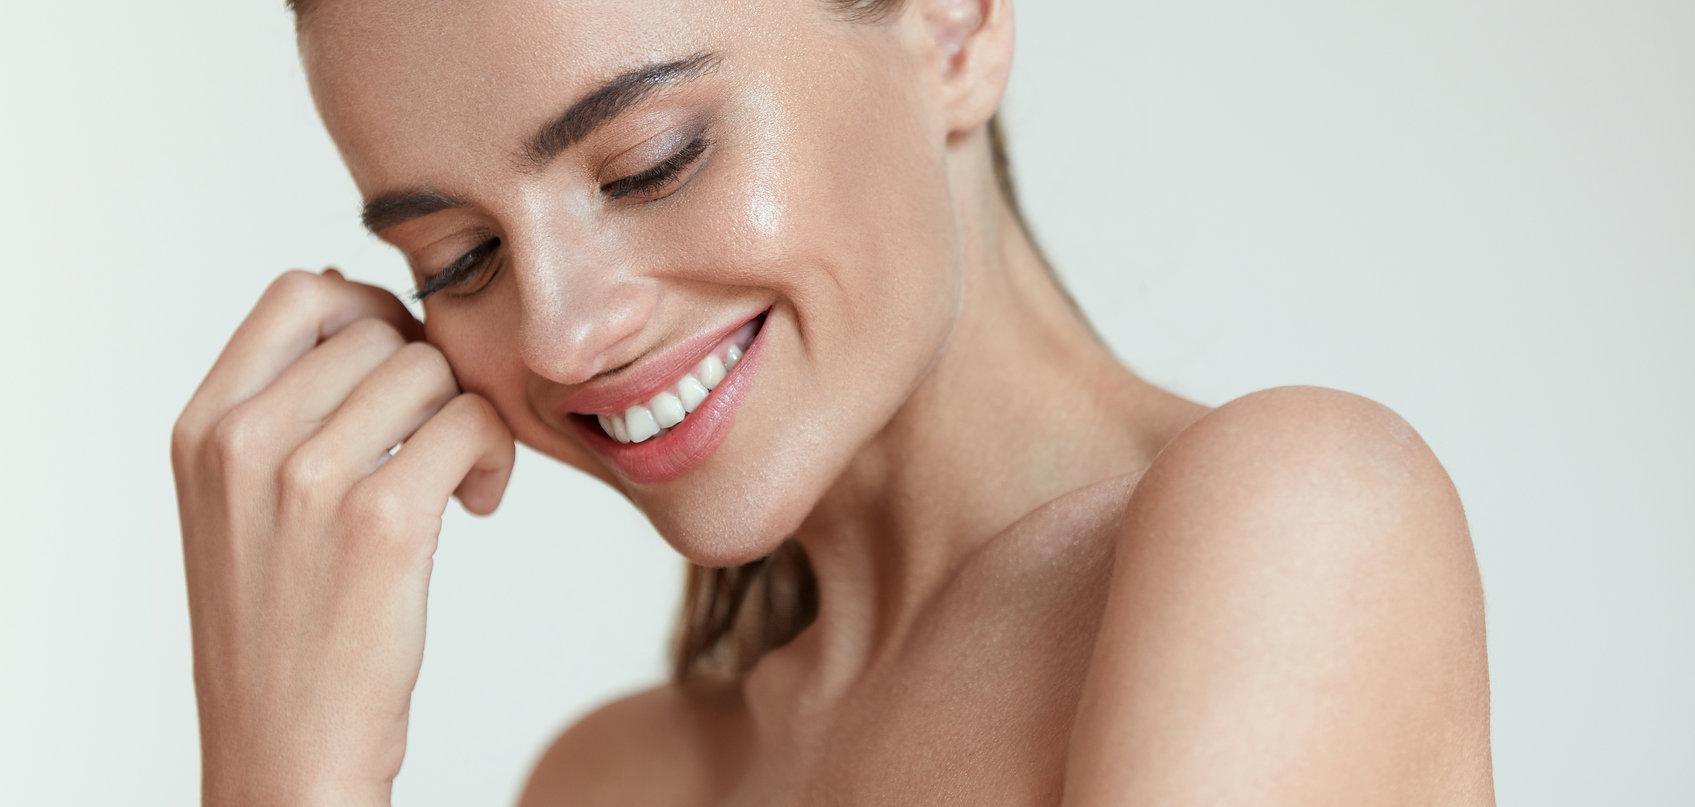 Pure White Cosmetics - Glowing Skin